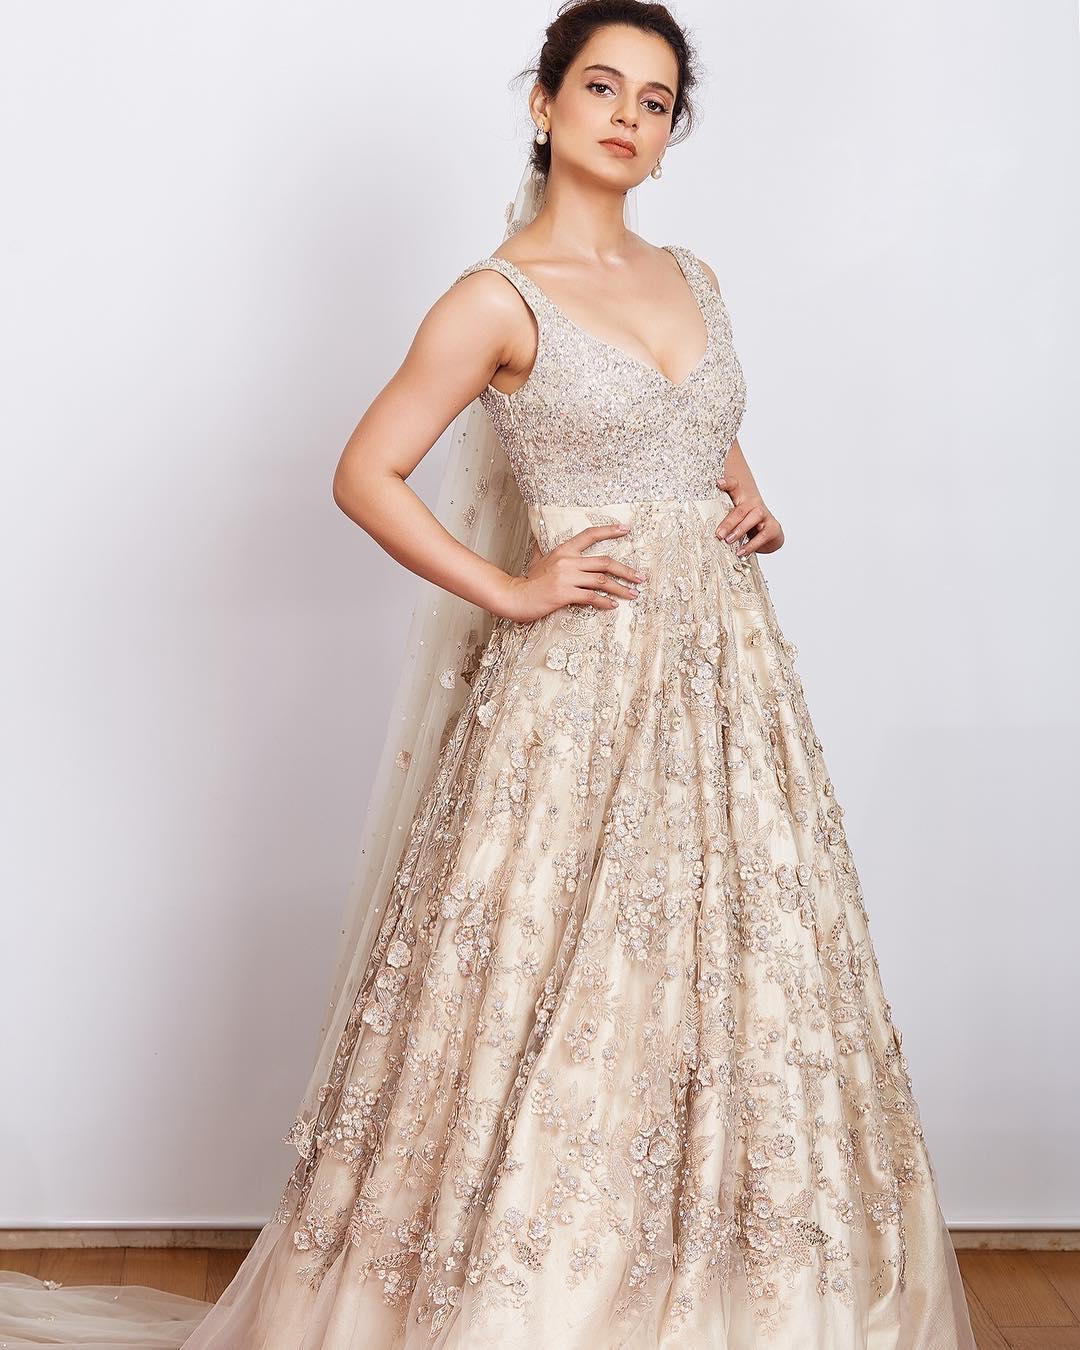 Shyamal and Bhumika, Lakme Fashion Week Summer Resort 2018, Lakme Fashion Week, Bridal Gown, Bollywood Fashion, Kangana Ranaut